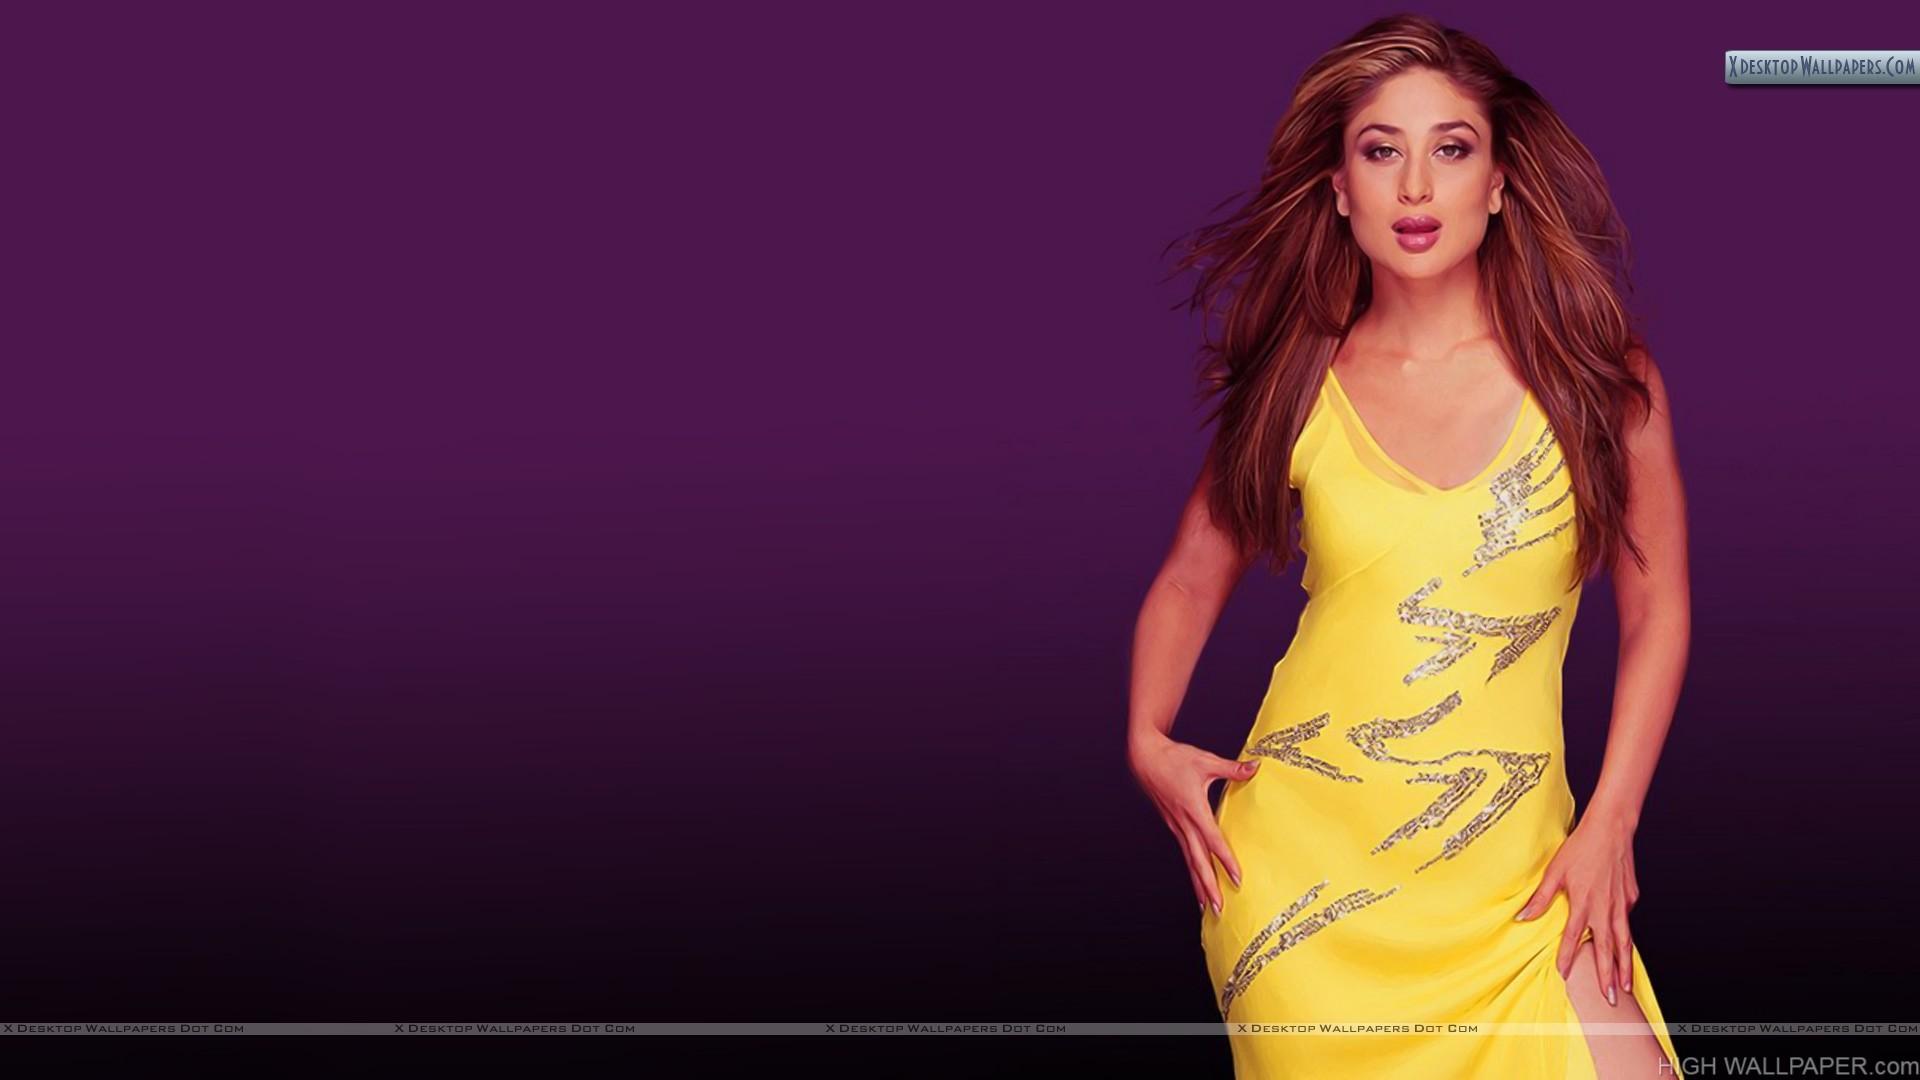 Kareena Kapoor In Sexy Yellow Dress